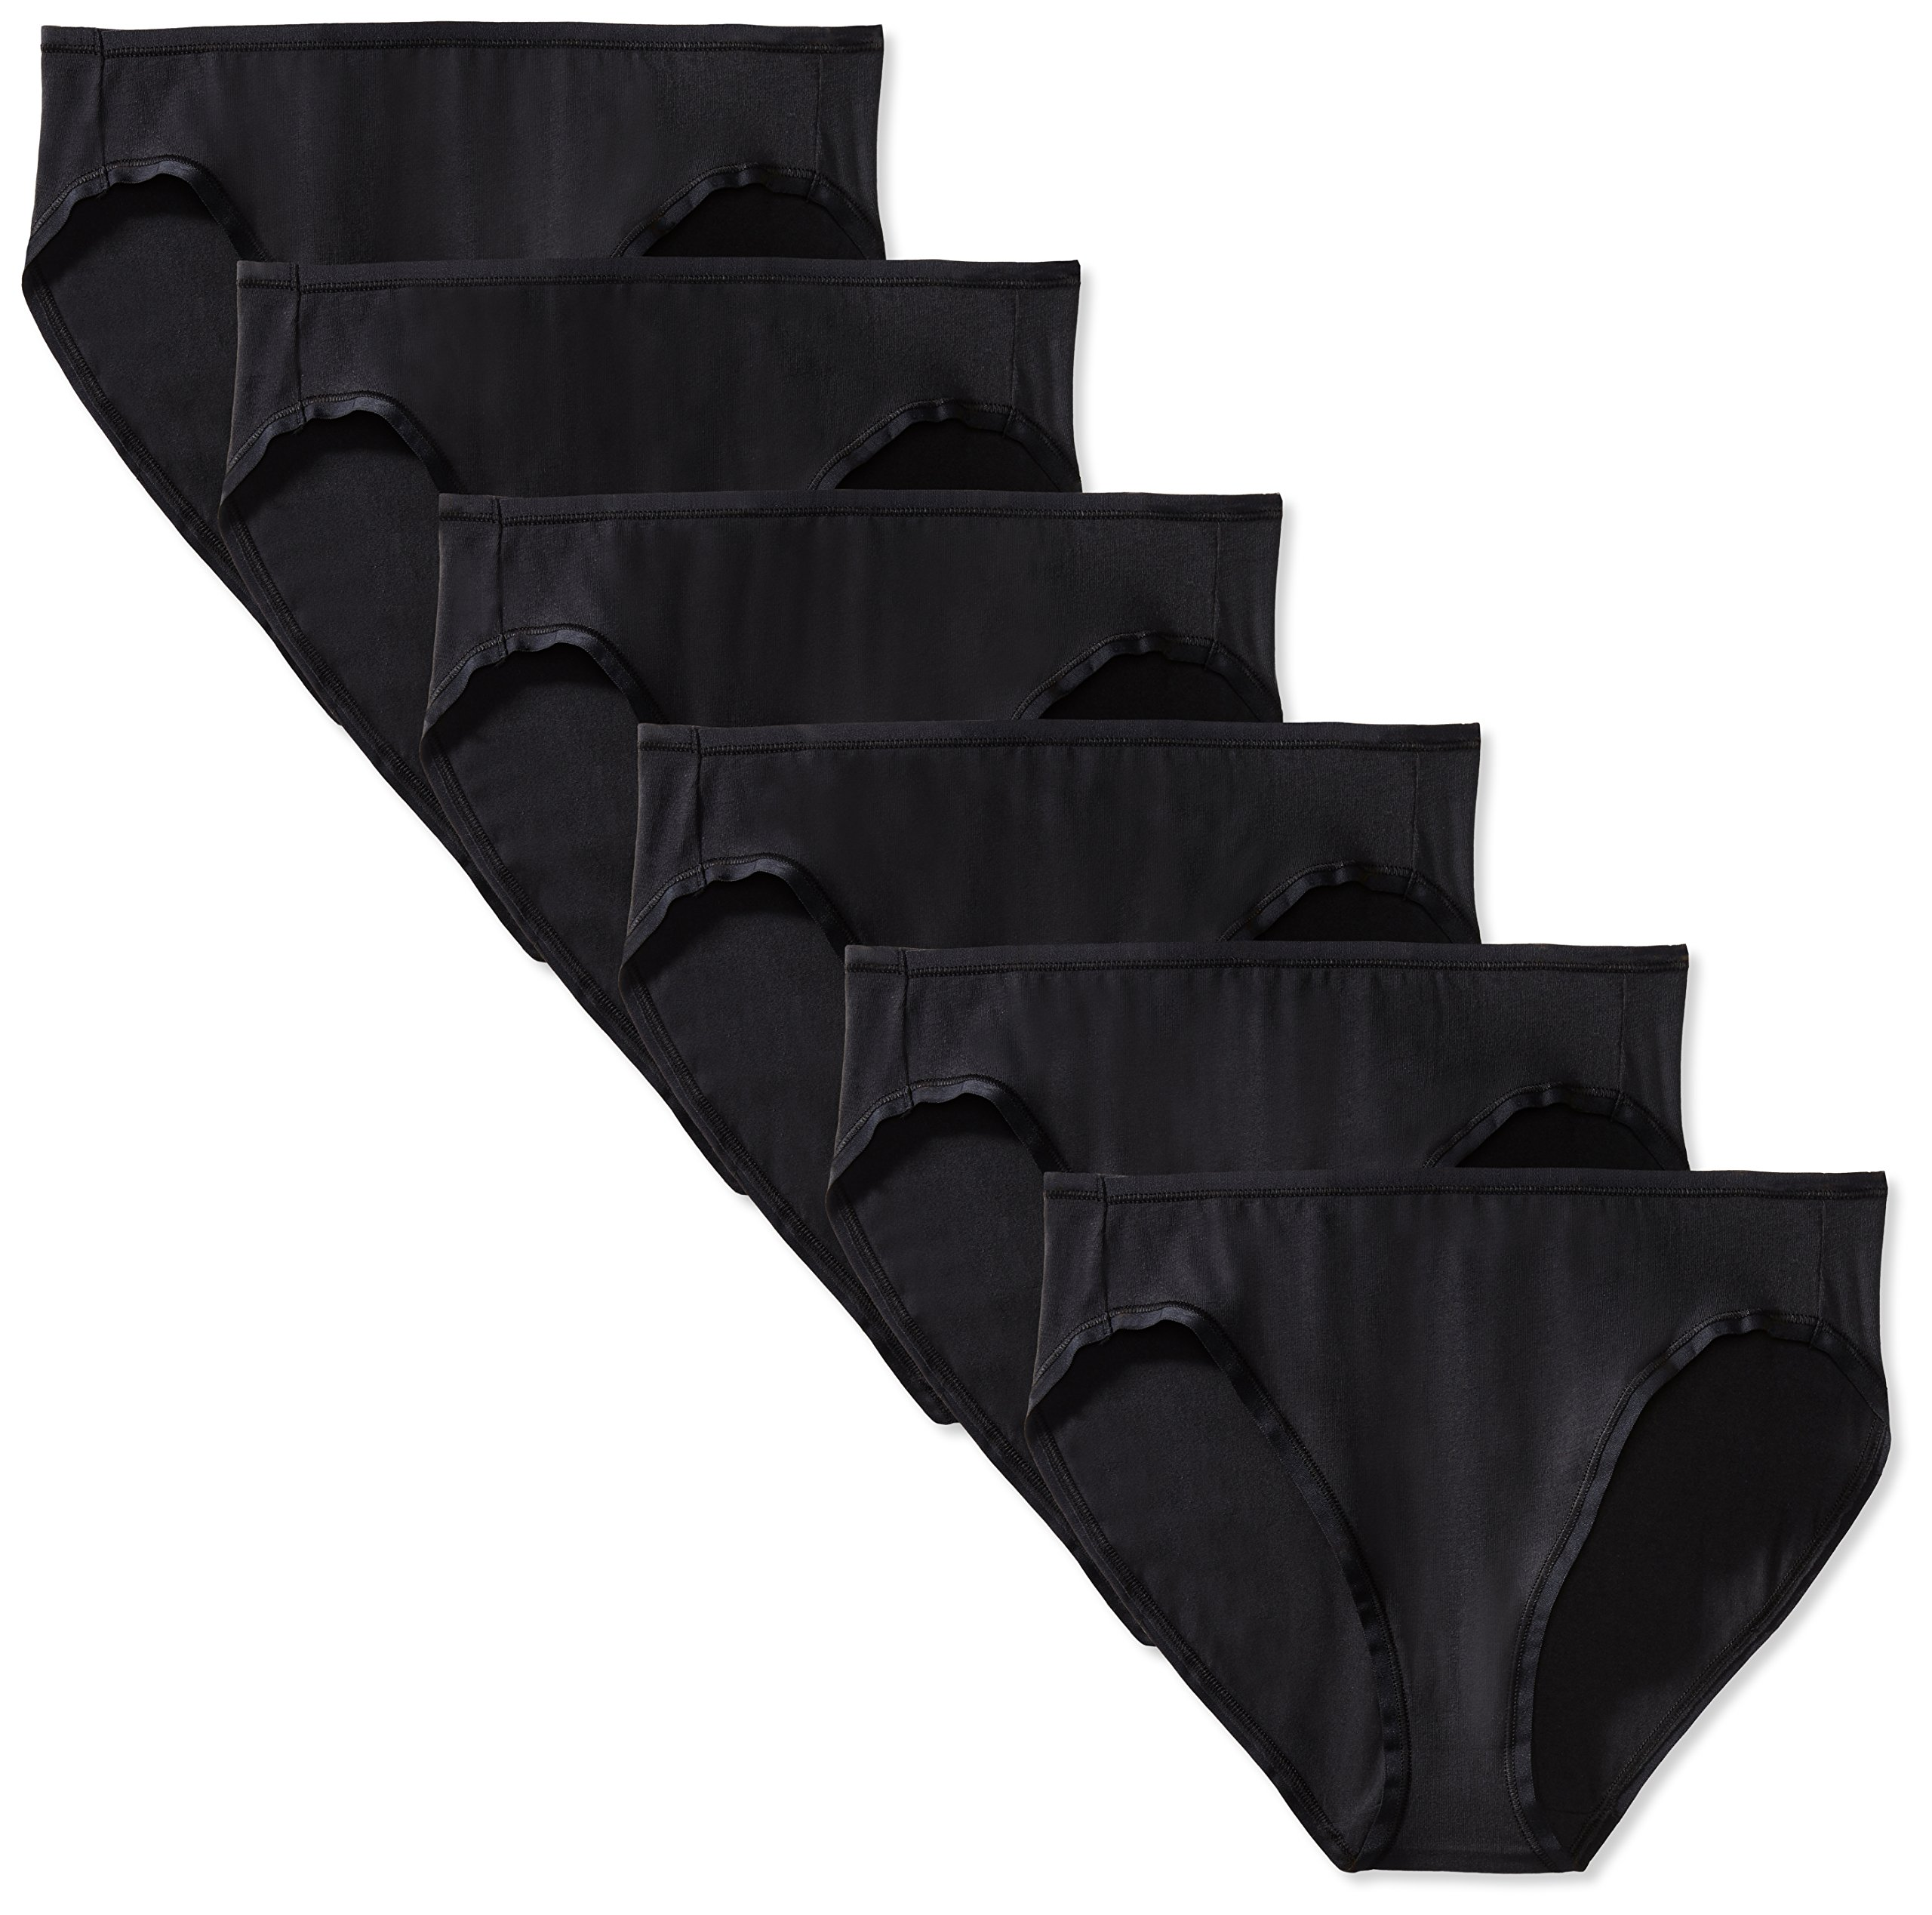 Amazon Essentials Women's Cotton Stretch Bikini Panty, 6-Pack, Black, X-Large